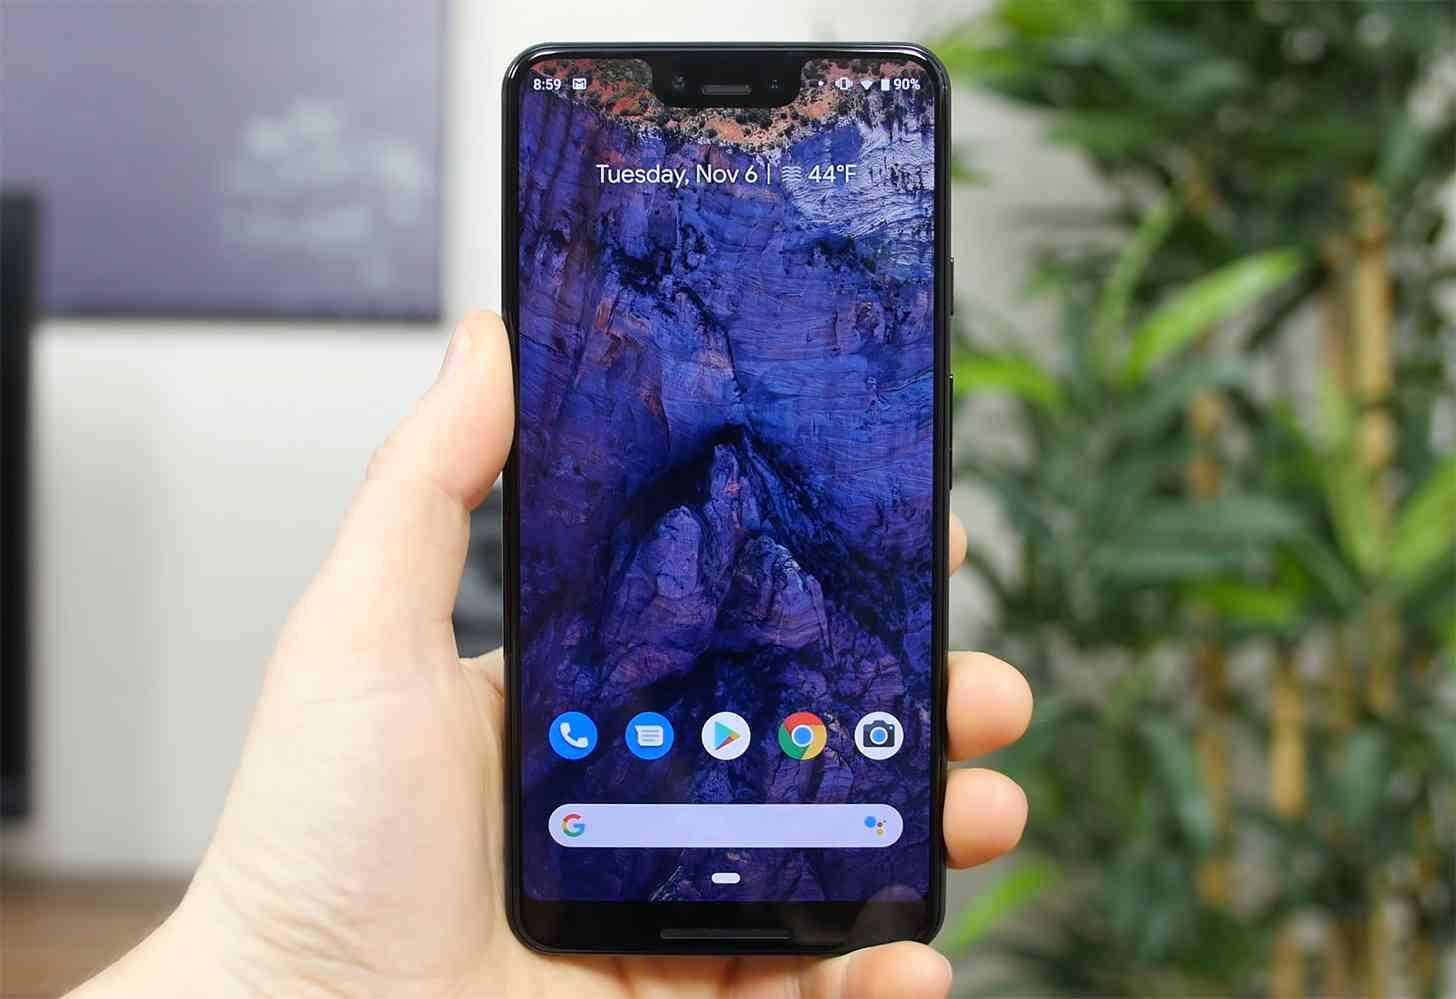 Google Pixel 3 XL hands-on